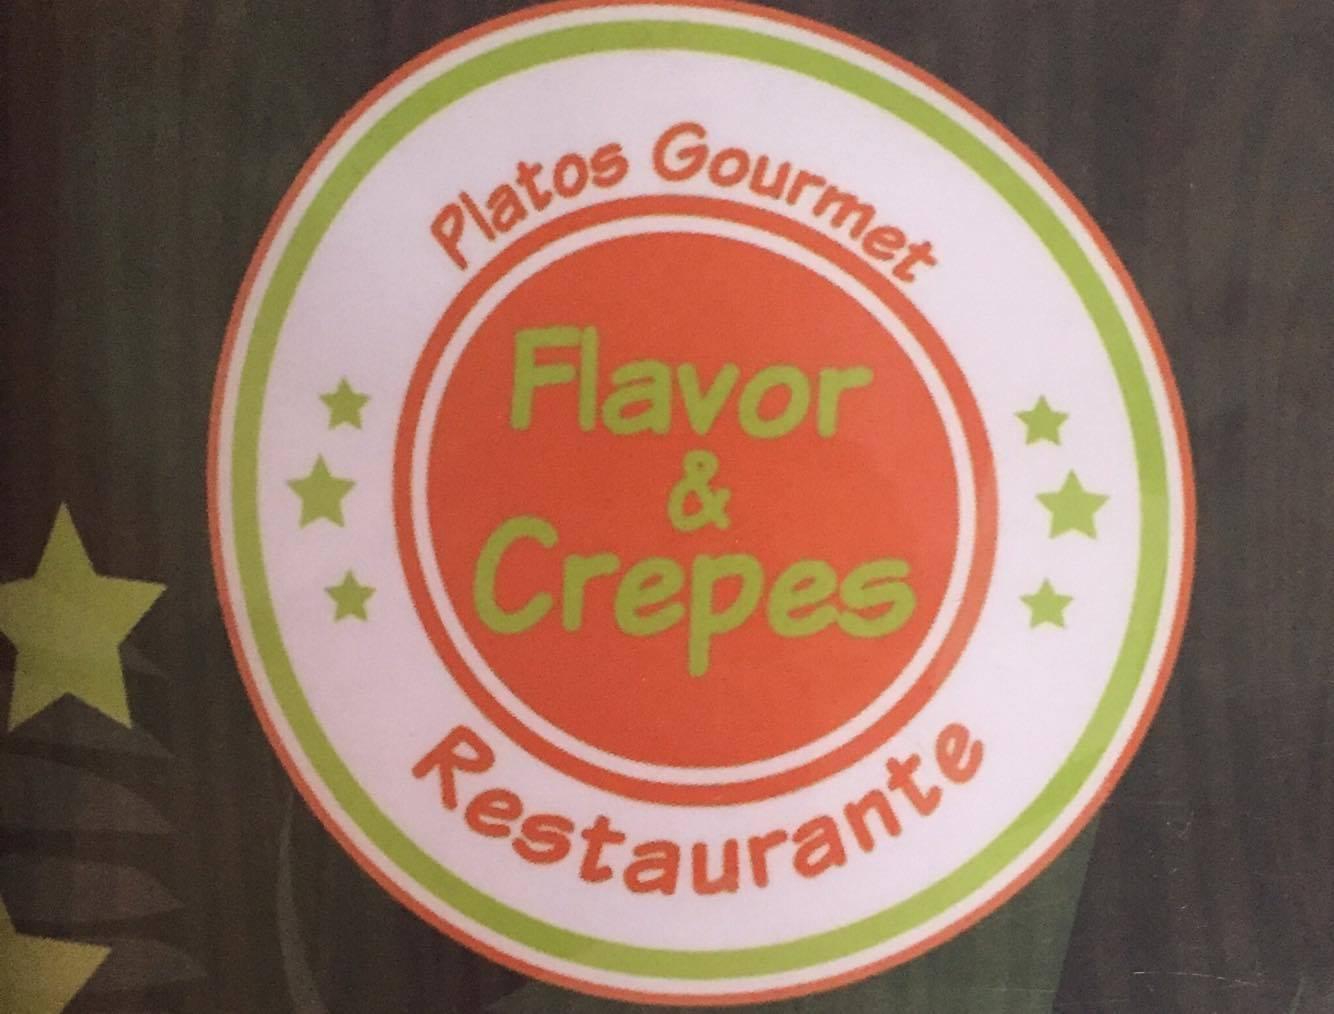 Flavor & Crepes